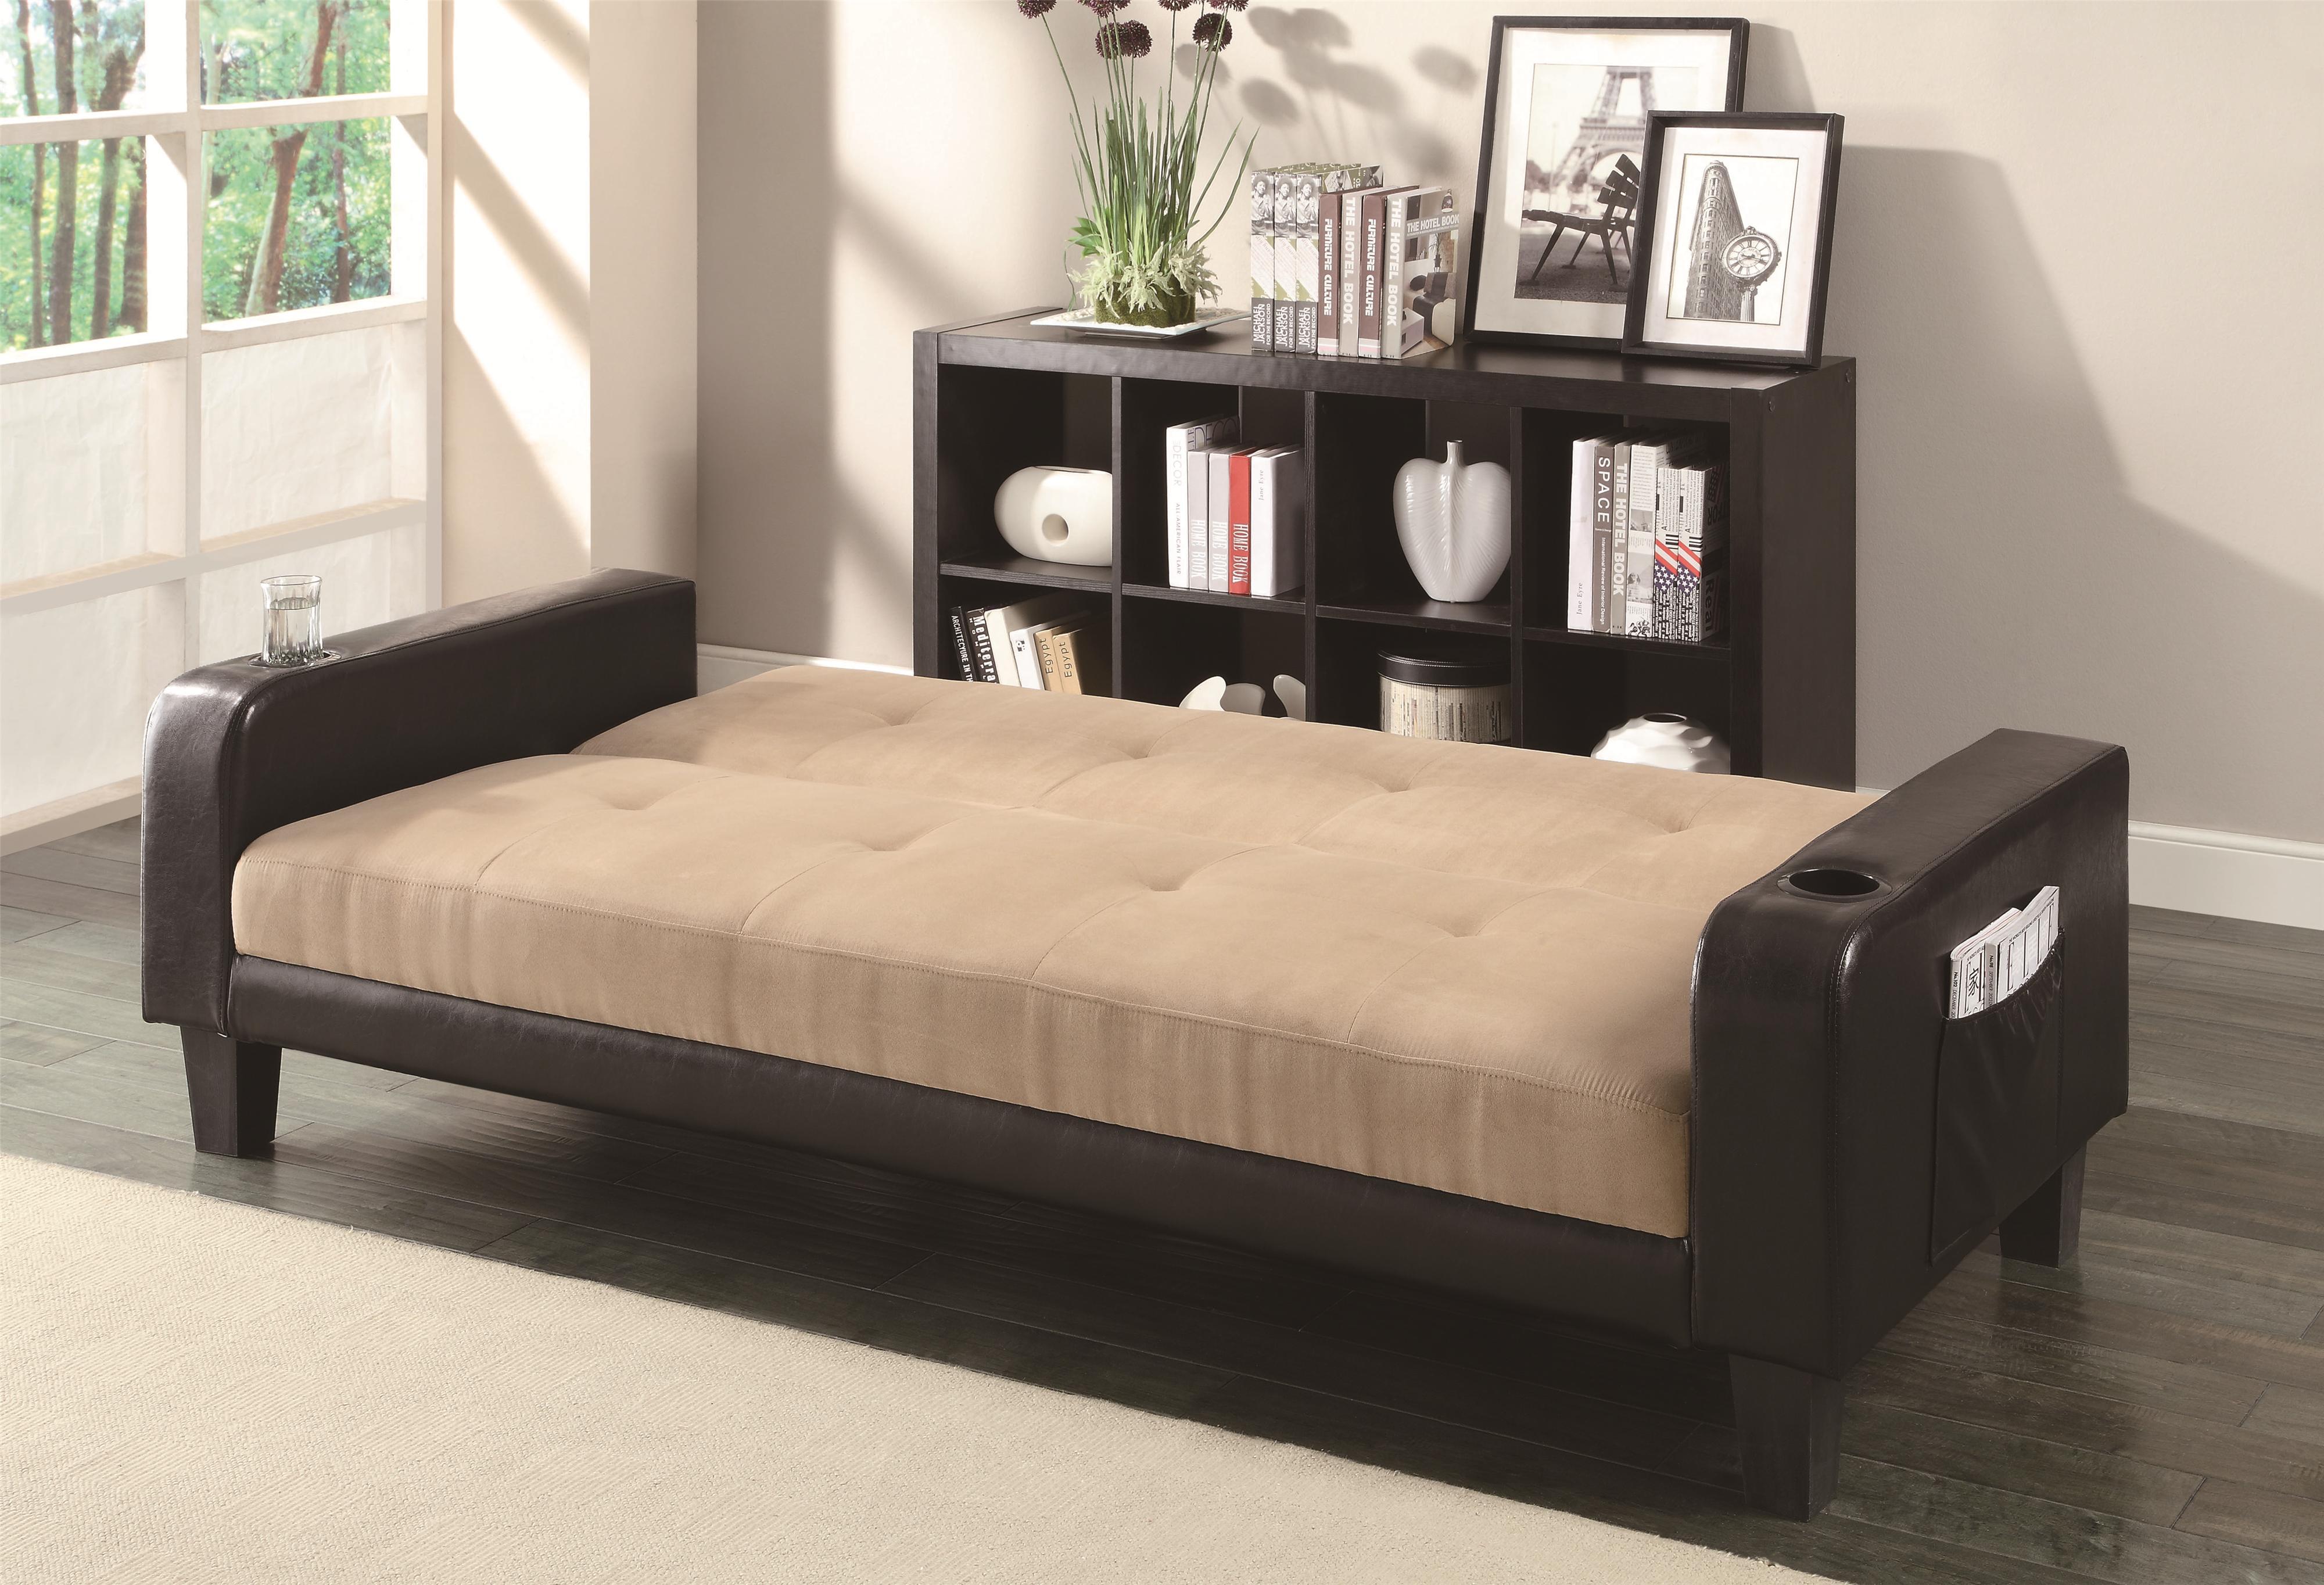 today dhp grey overstock futon garden shipping light queen premium city free linen home product